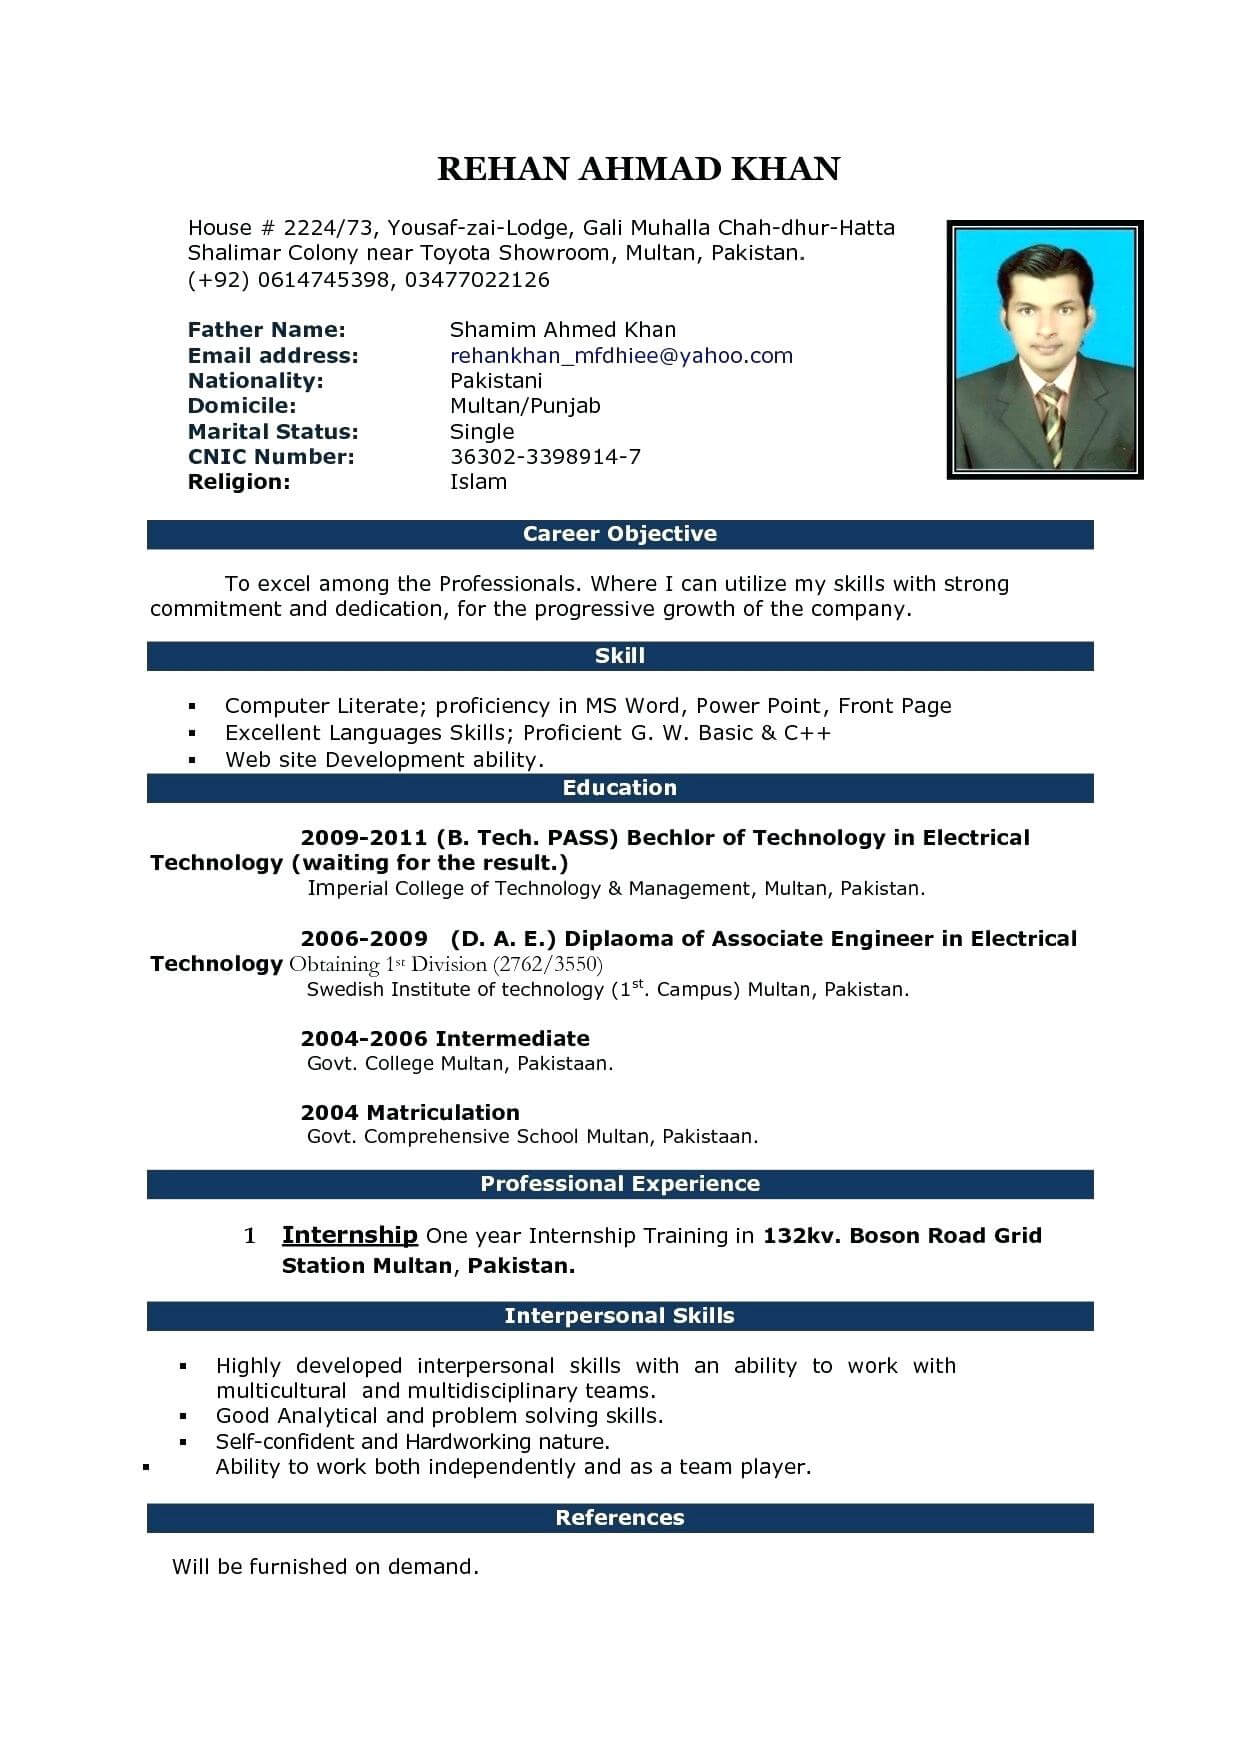 Resume: Resume Template On Microsoft Word 2010 In Resume Templates Word 2010